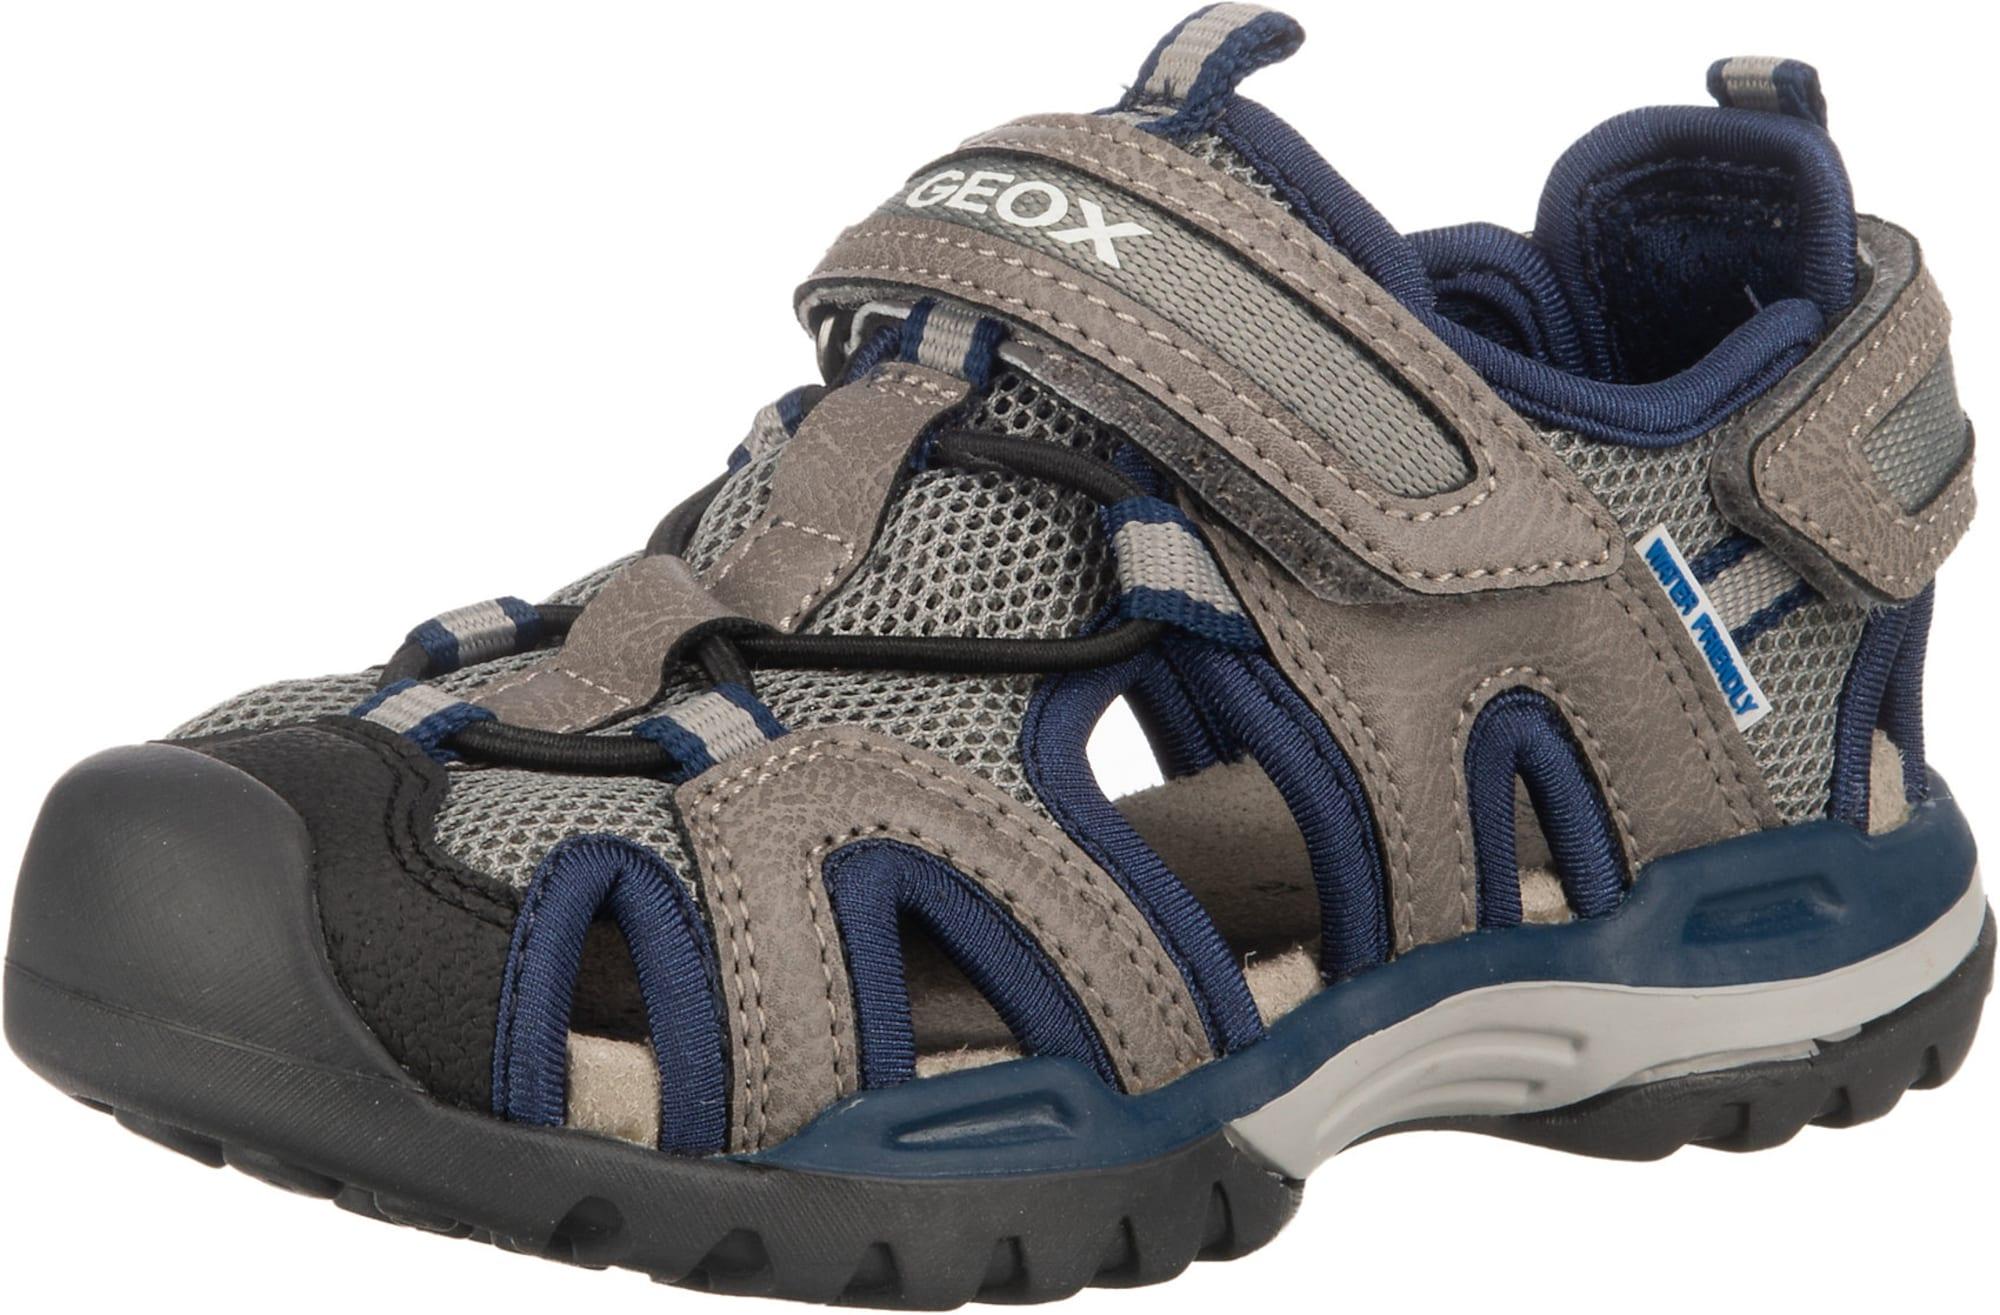 GEOX Atviri batai pilka / tamsiai mėlyna